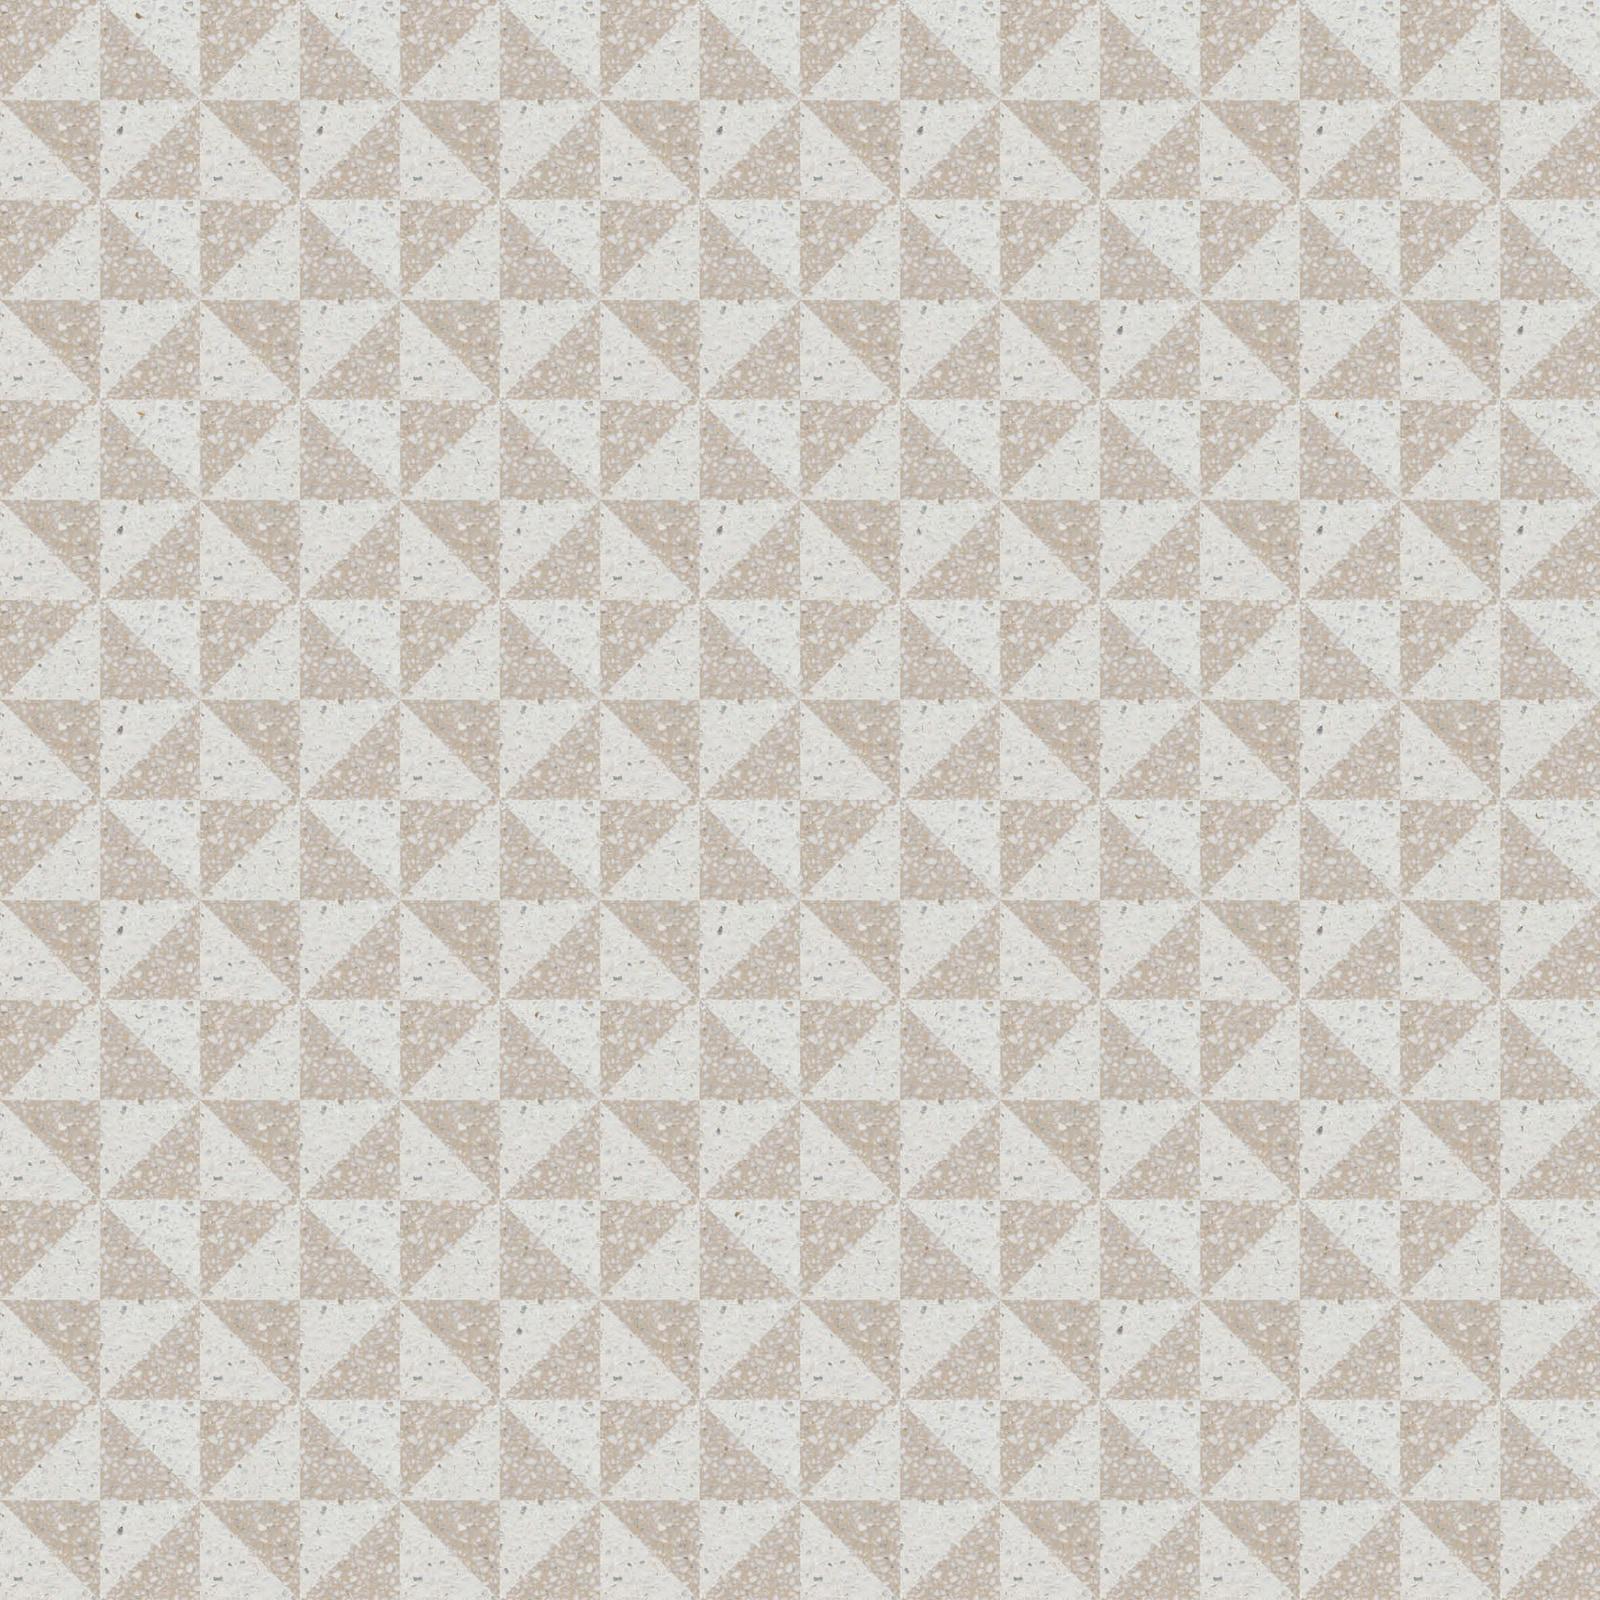 VIA Terrazzo grob in hellem Dreieck Muster